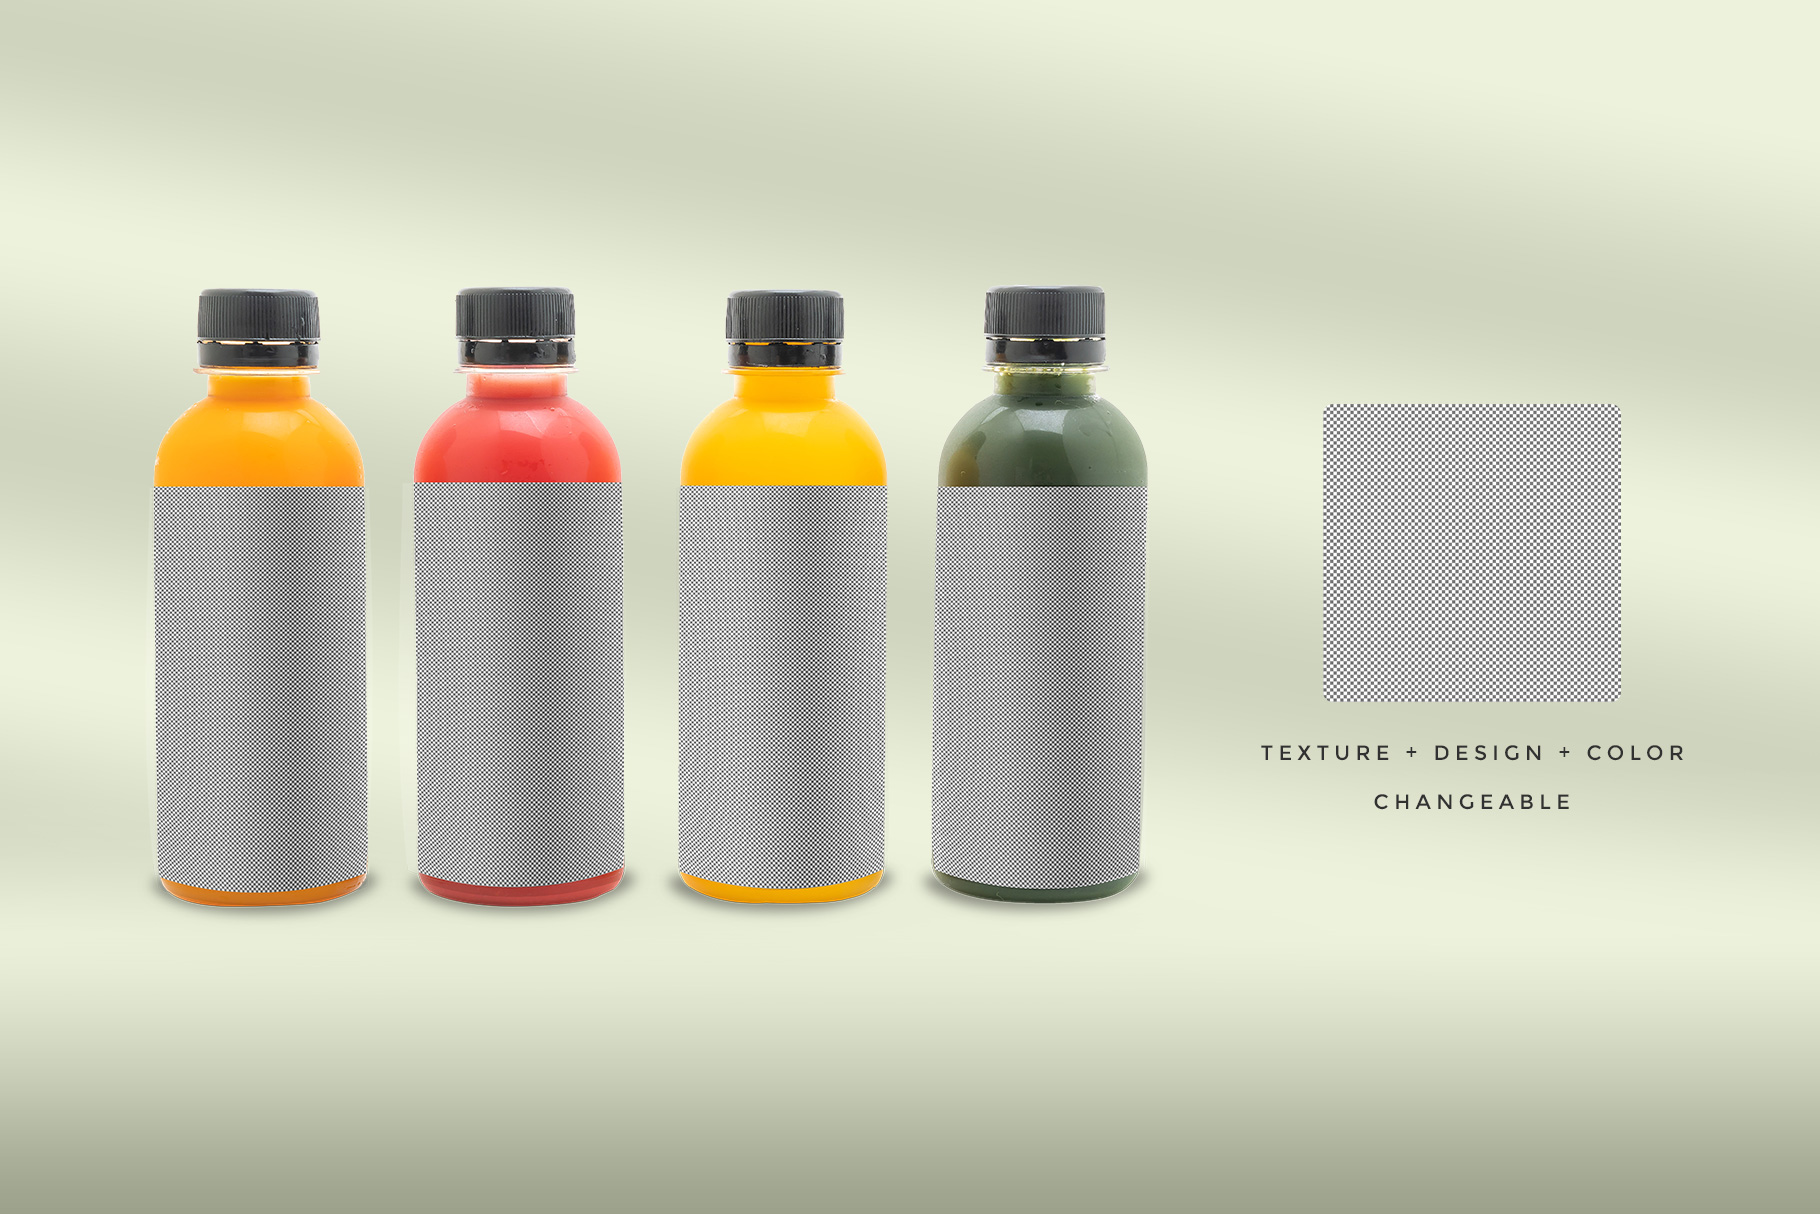 editability of the plastic health drink bottles packaging mockup